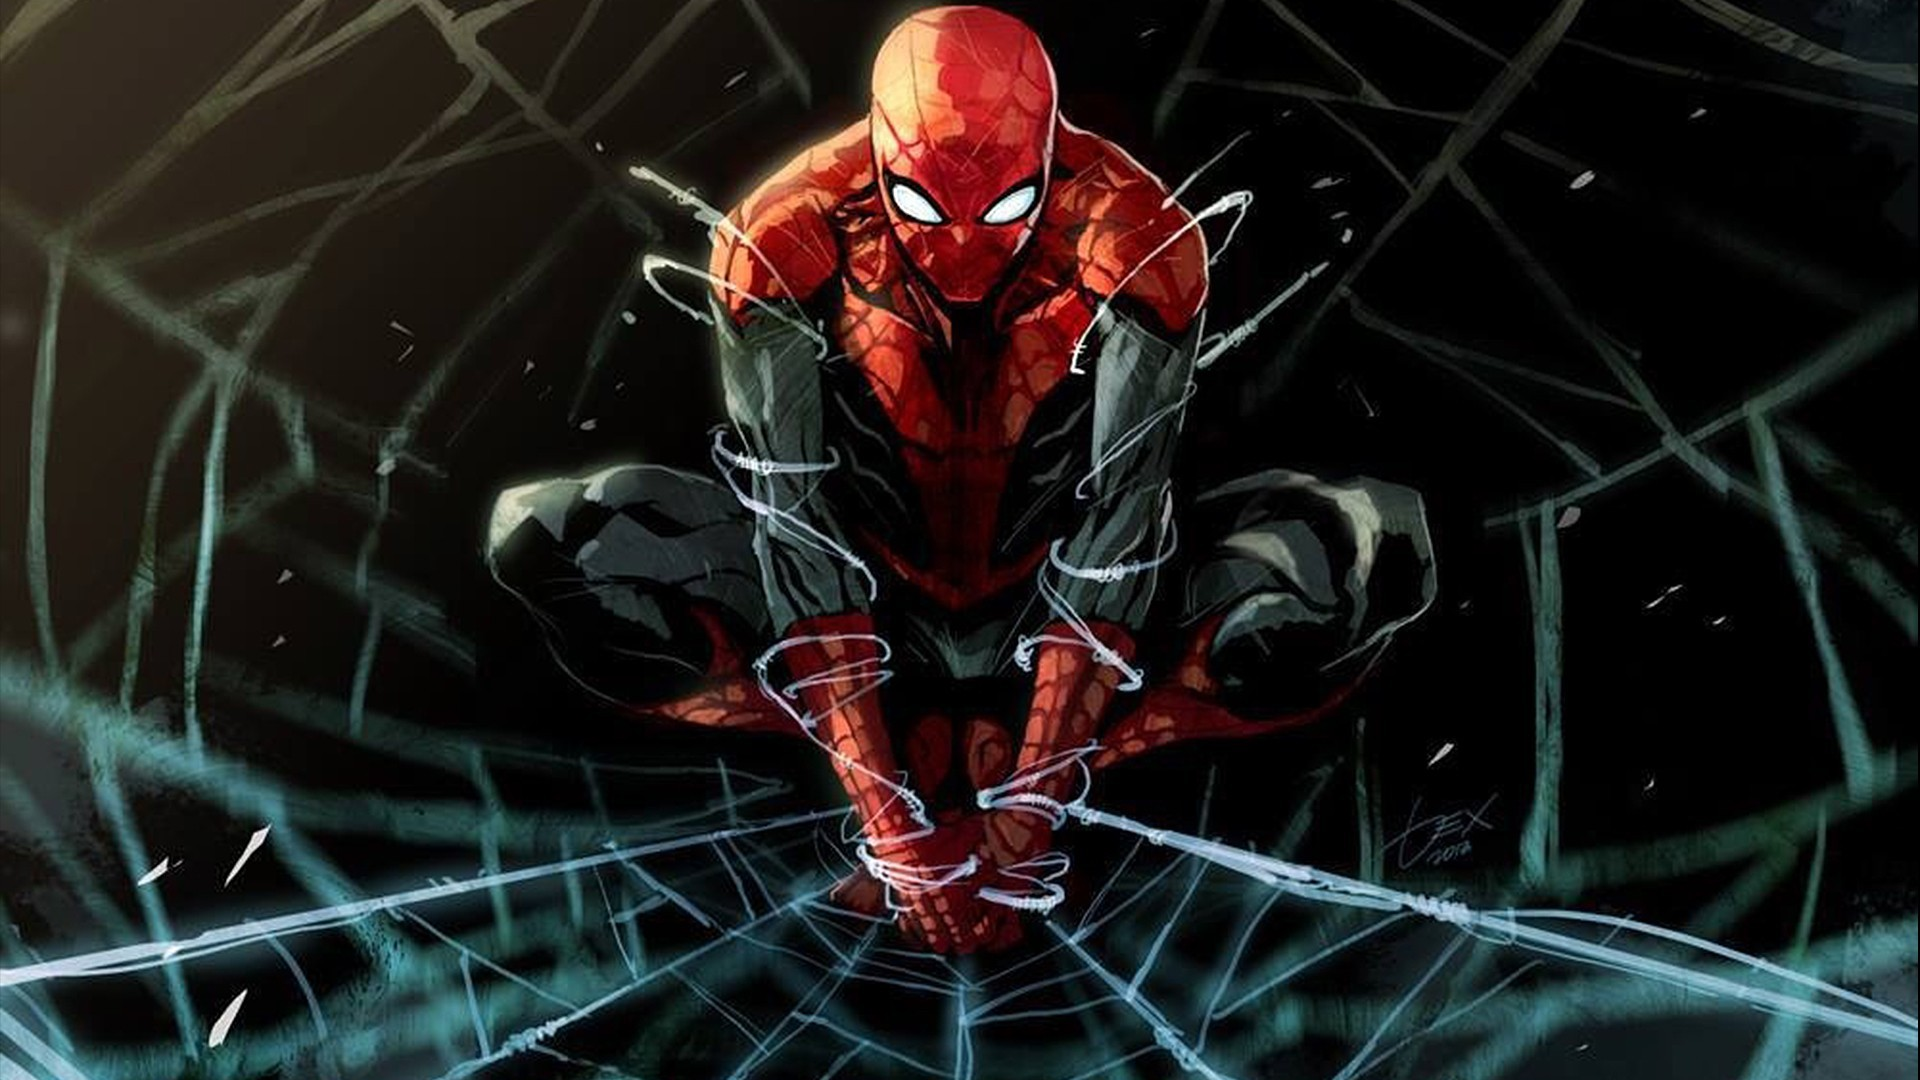 Cartoon spiderman picture cartoon spiderman wallpaper - Images spiderman ...